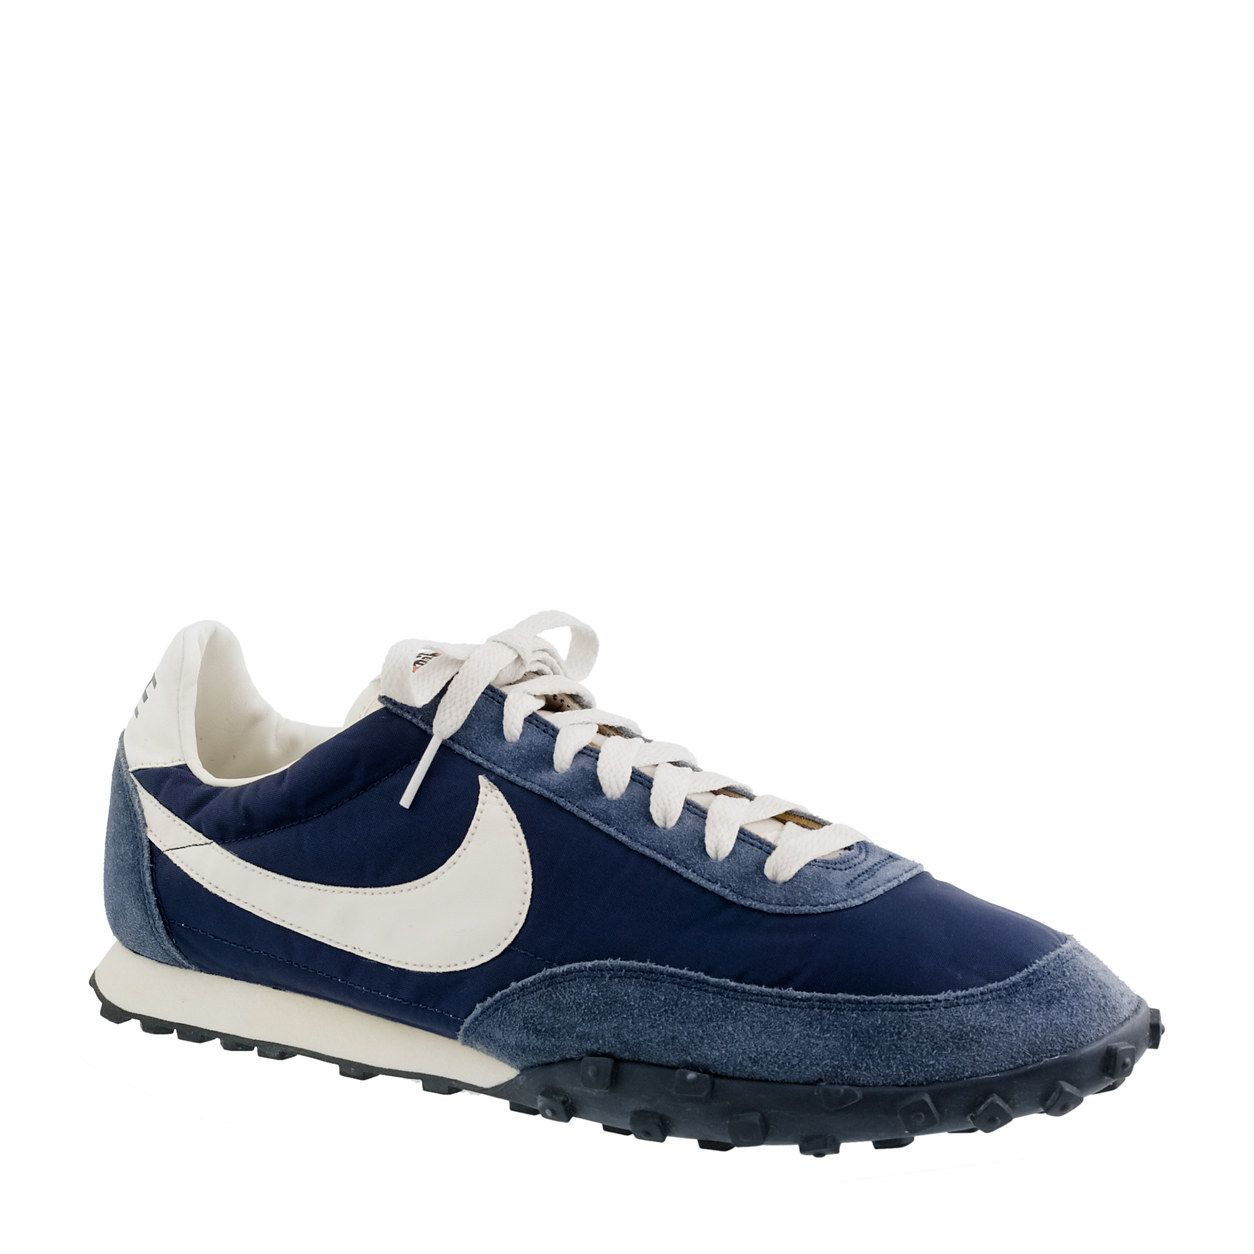 c47828ac625 Nike® Vintage Collection Waffle® Racer sneakers - shoes   accessories -  Men s catalog jcrew.com exclusives - J.Crew